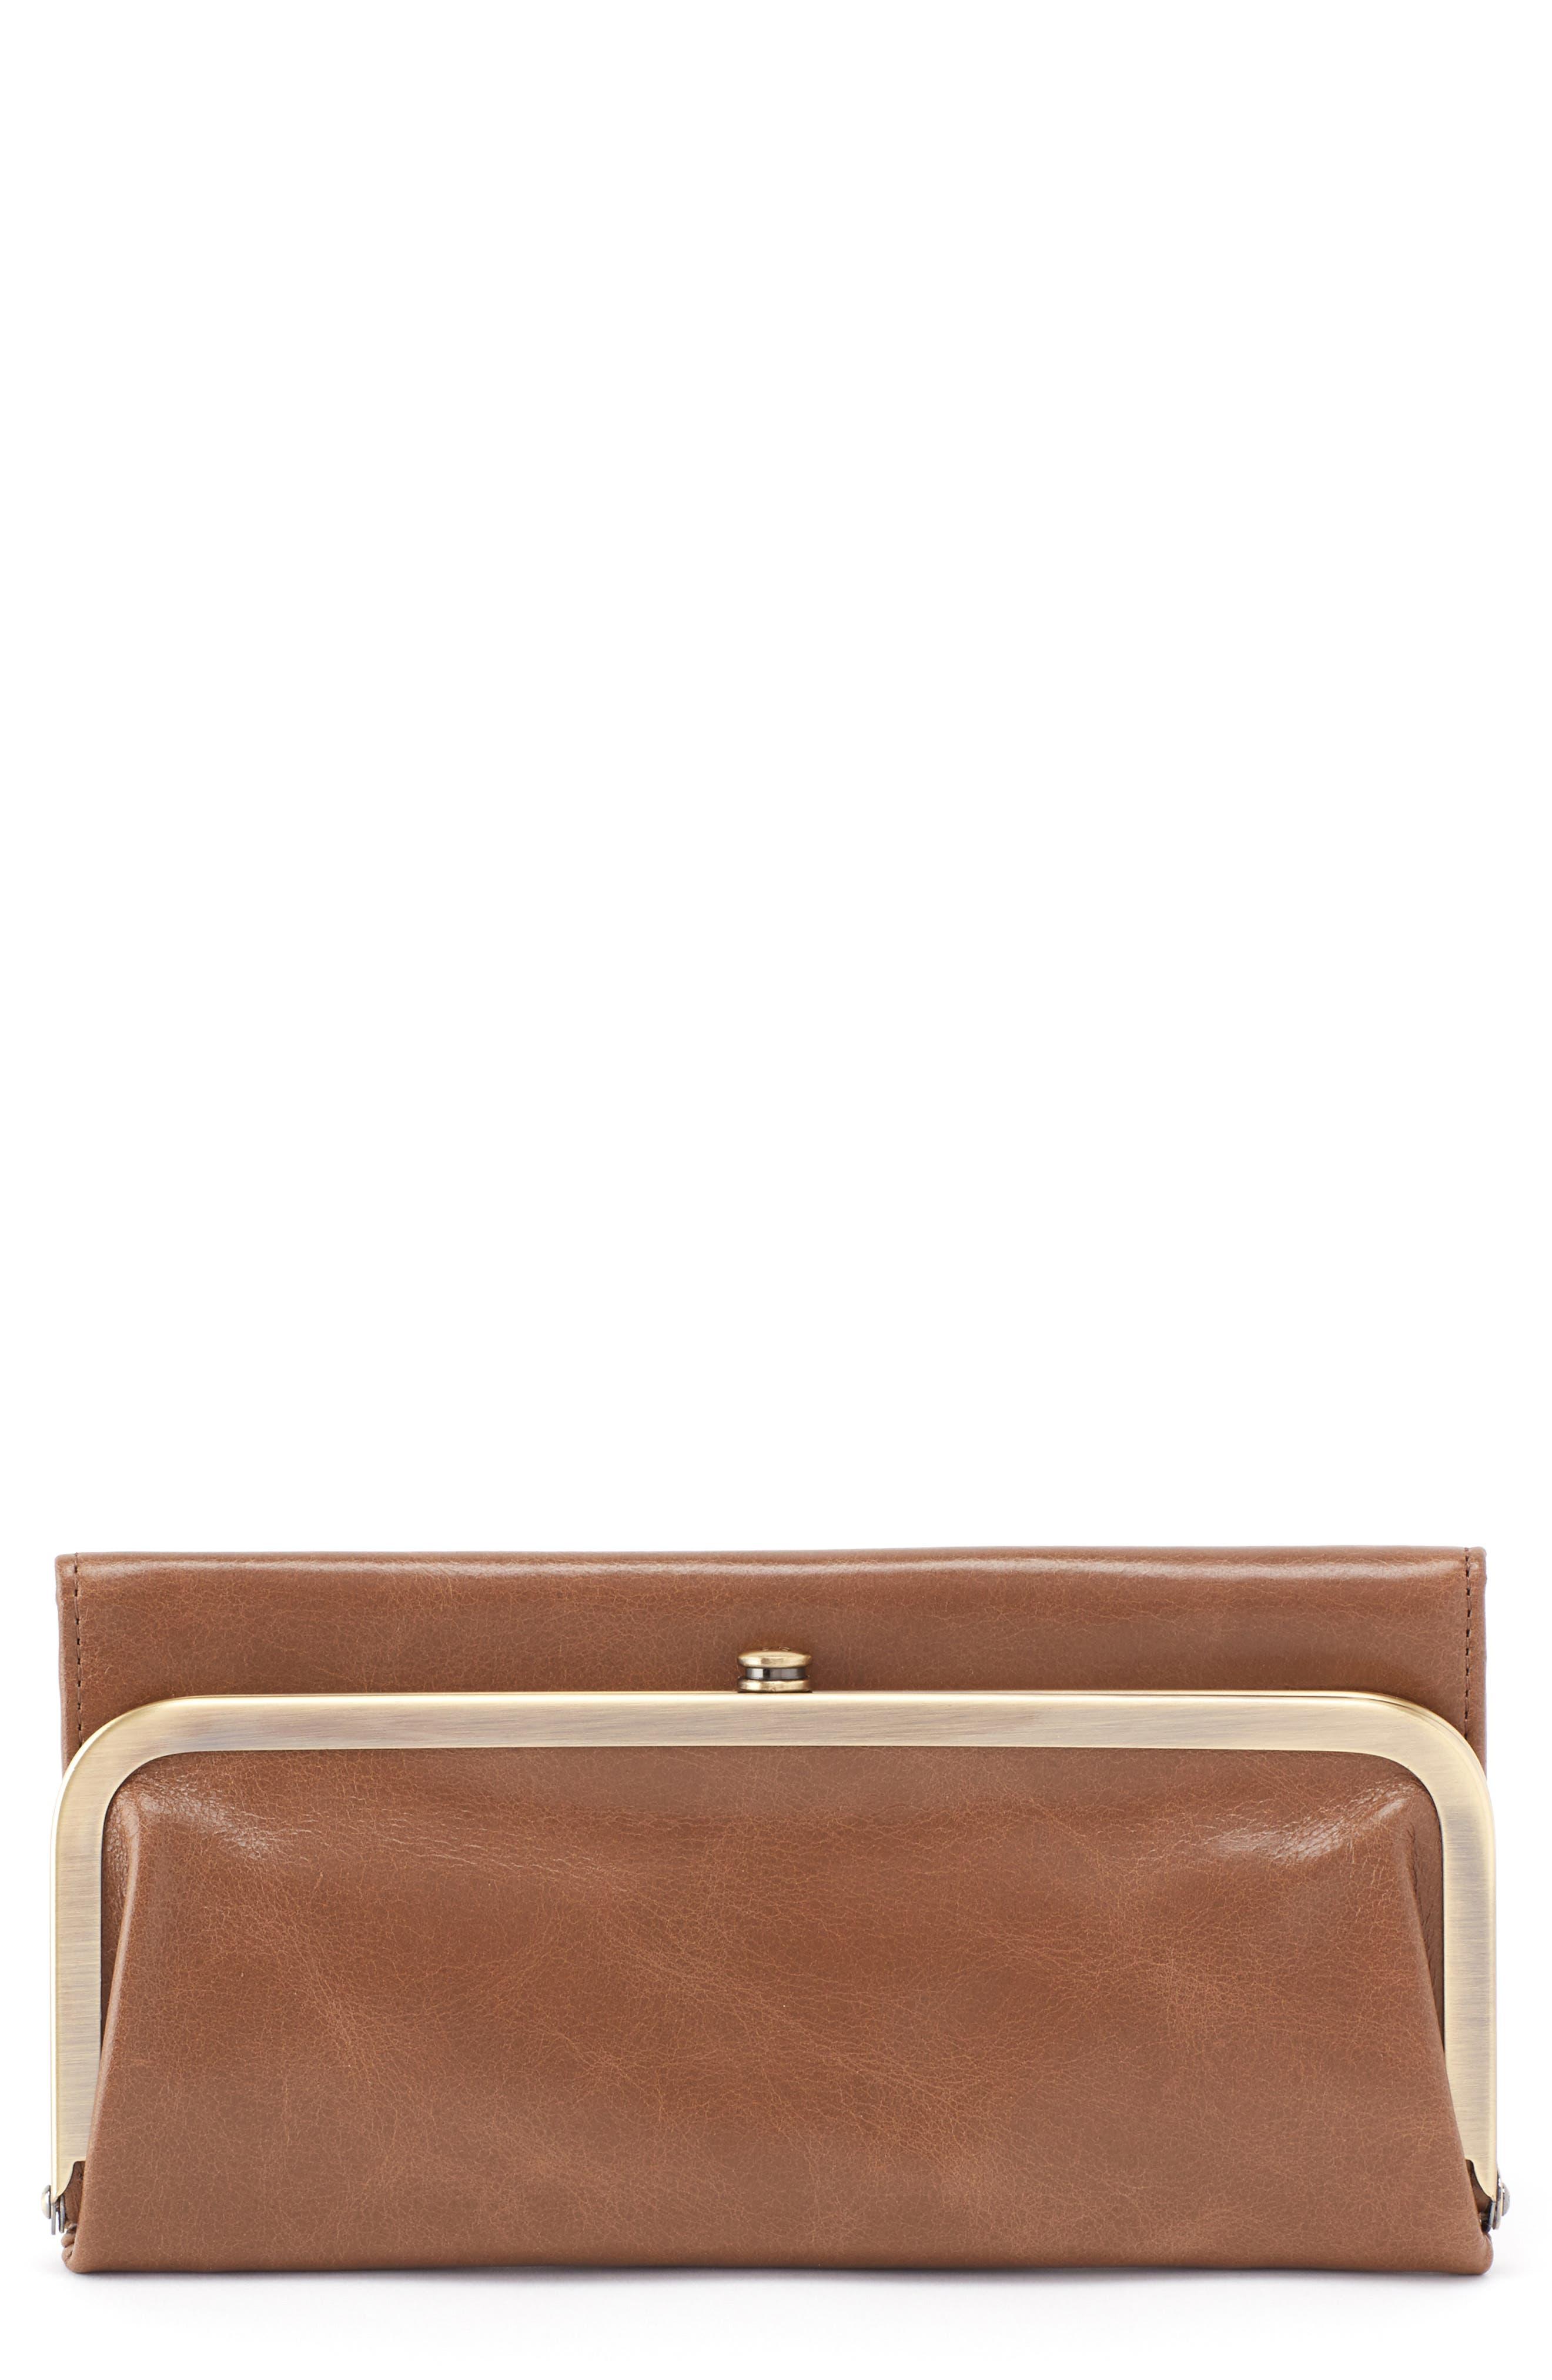 Rachel Frame Wallet,                         Main,                         color, Mink